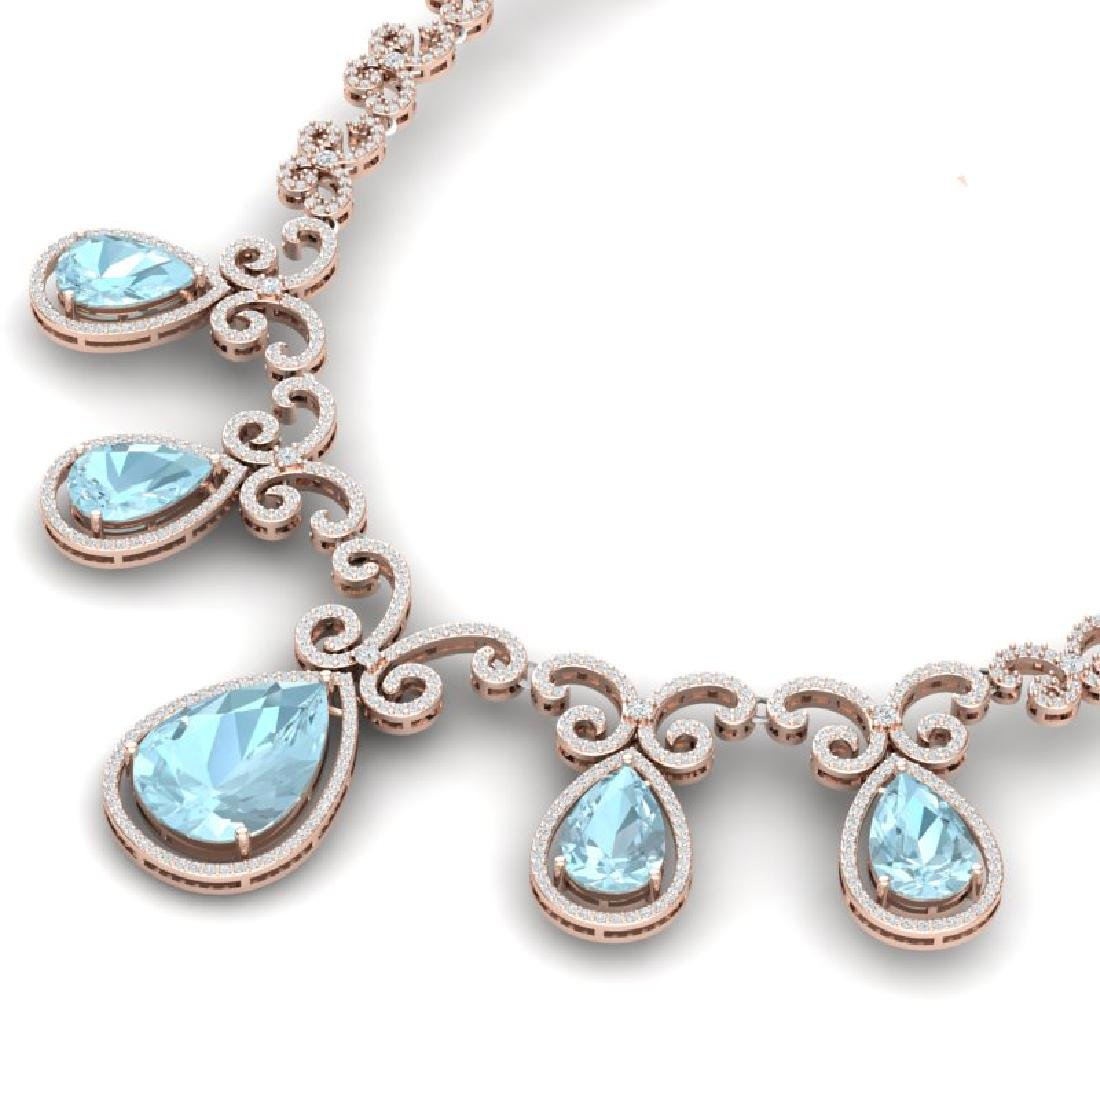 40.45 CTW Royalty Sky Topaz & VS Diamond Necklace 18K - 2